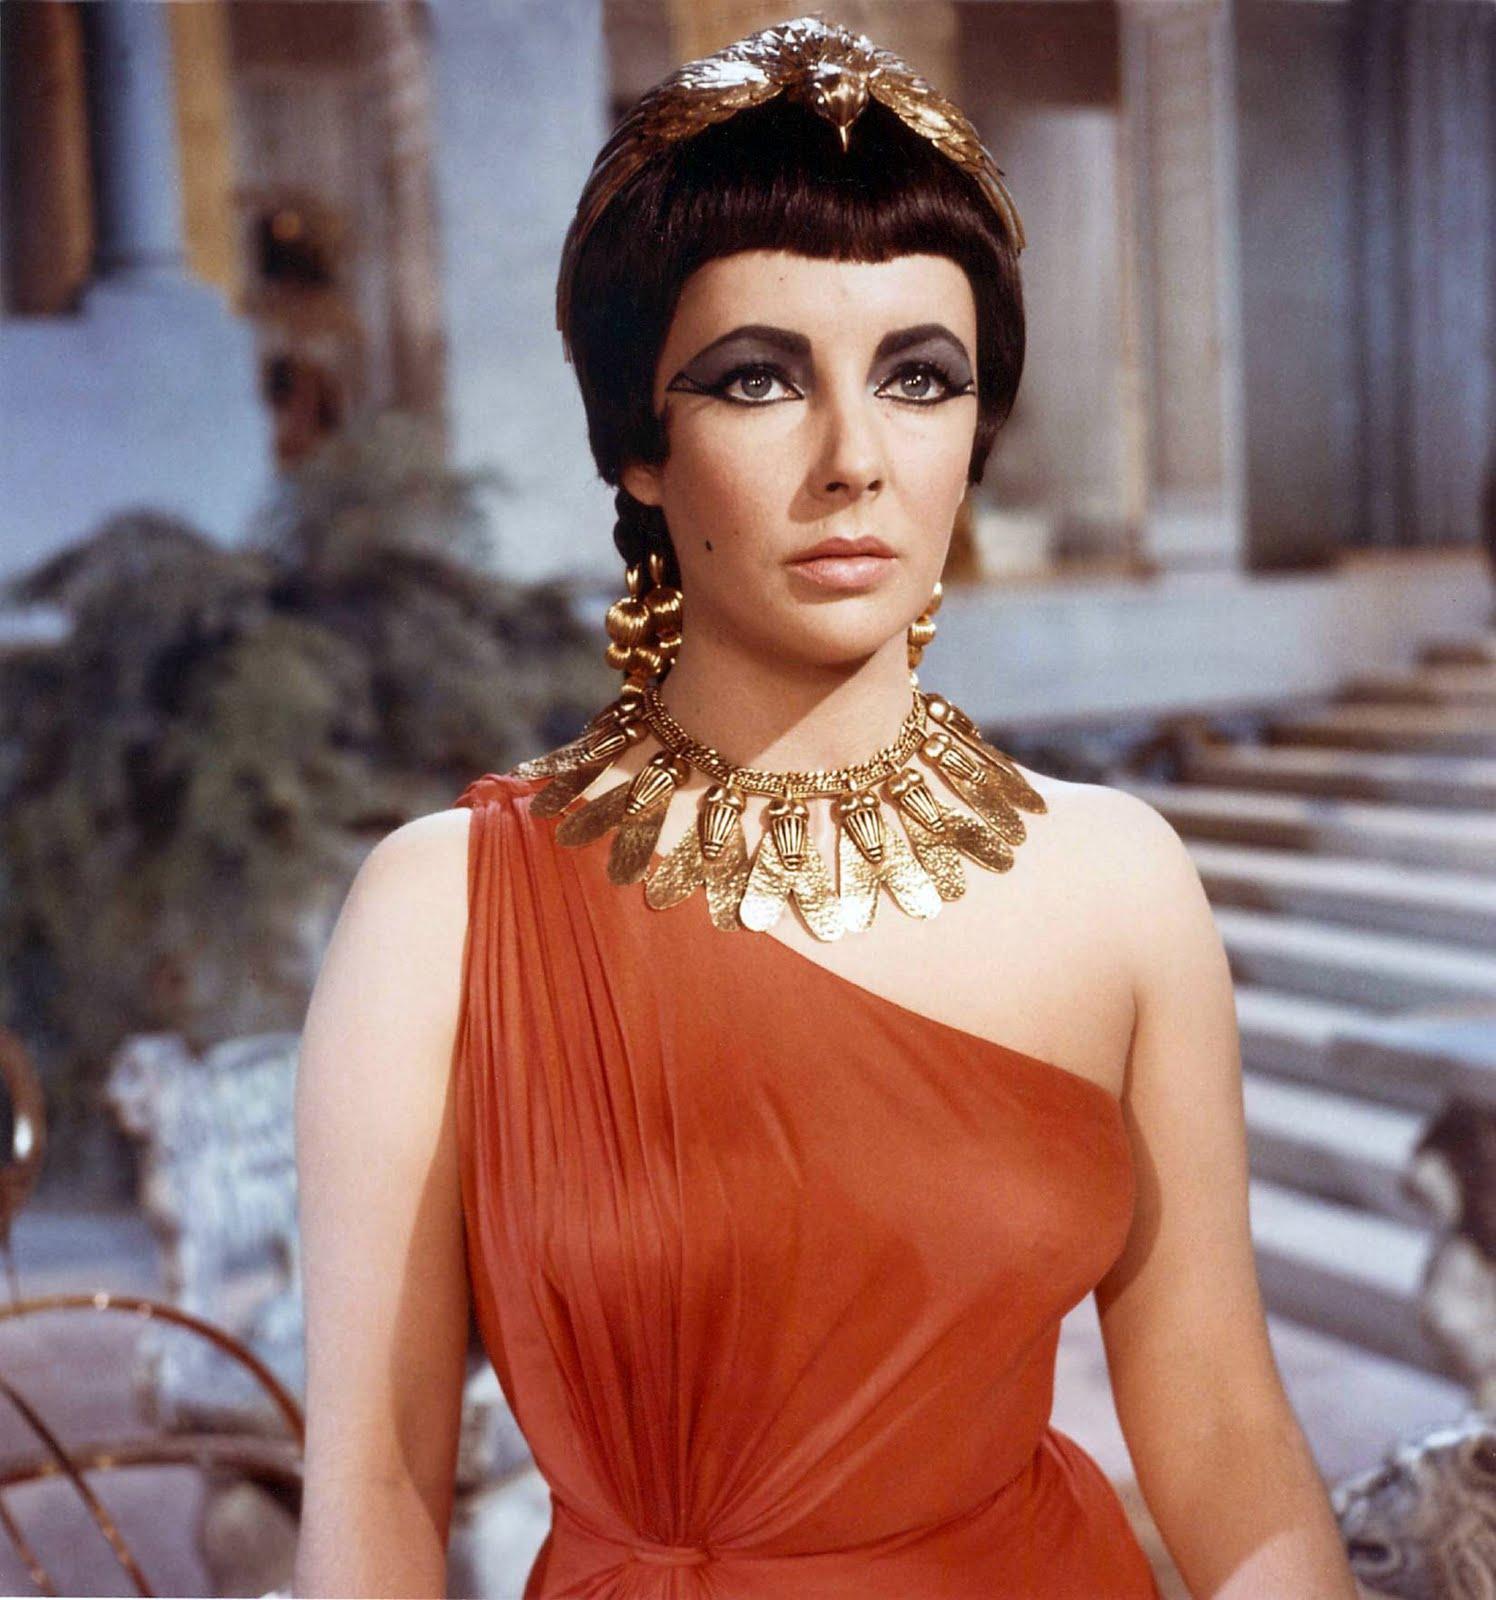 http://2.bp.blogspot.com/-RvZ2l37Lp2A/TYy_bmhRSaI/AAAAAAAAAew/qXexxw0EudY/s1600/Cleopatra-elizabeth-taylor-4582447-1646-1761.jpg